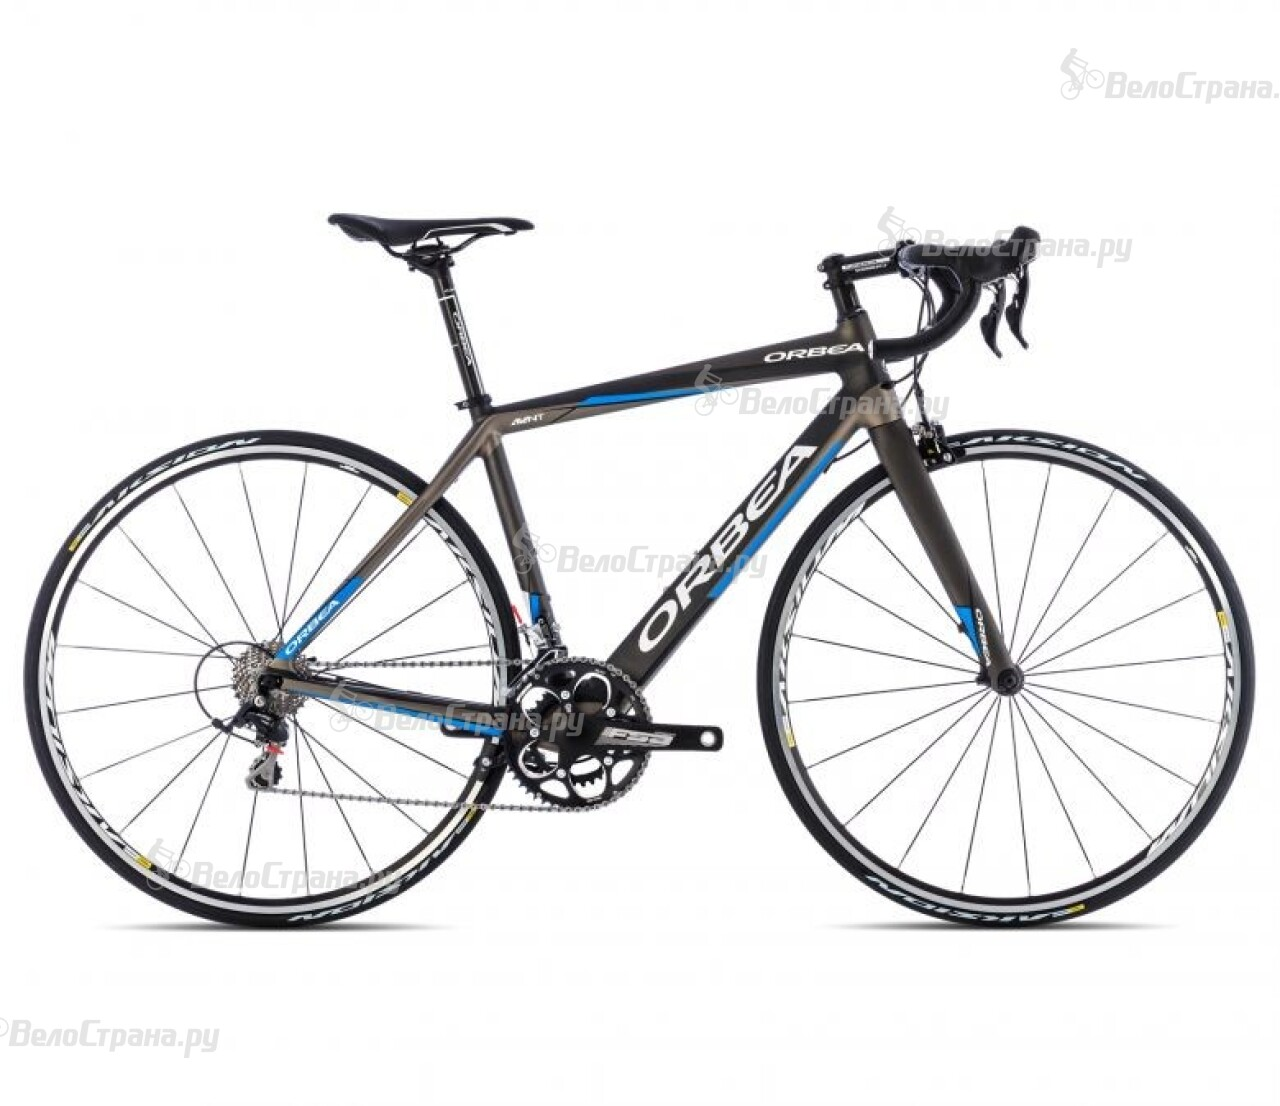 Велосипед Orbea Avant M50 (2014) аккумулятор для ноутбука oem 5200mah asus n61 n61j n61d n61v n61vg n61ja n61jv n53 a32 m50 m50s n53s n53sv a32 m50 a32 n61 a32 x 64 33 m50 n53s n53 a32 m50 m50s n53s n53sv a32 m50